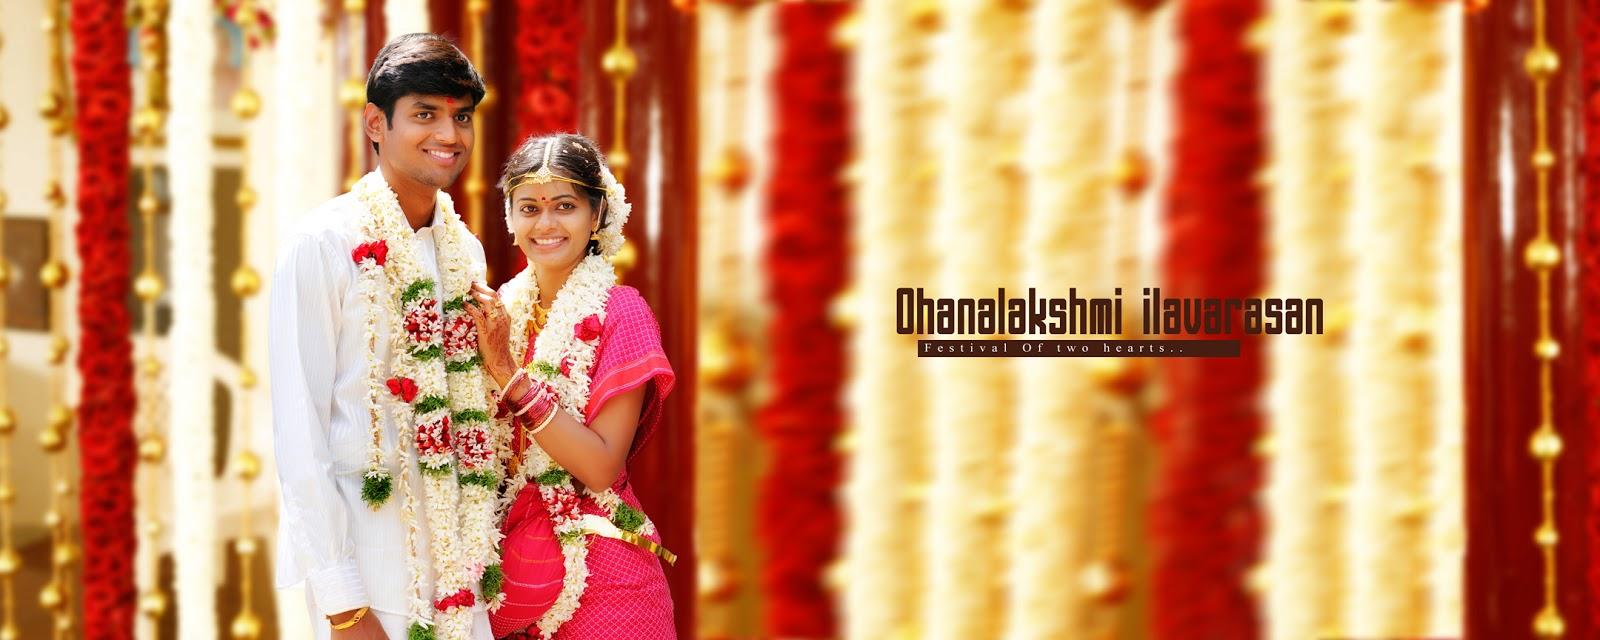 May 2013 Chennai Wedding Album Designing Service All